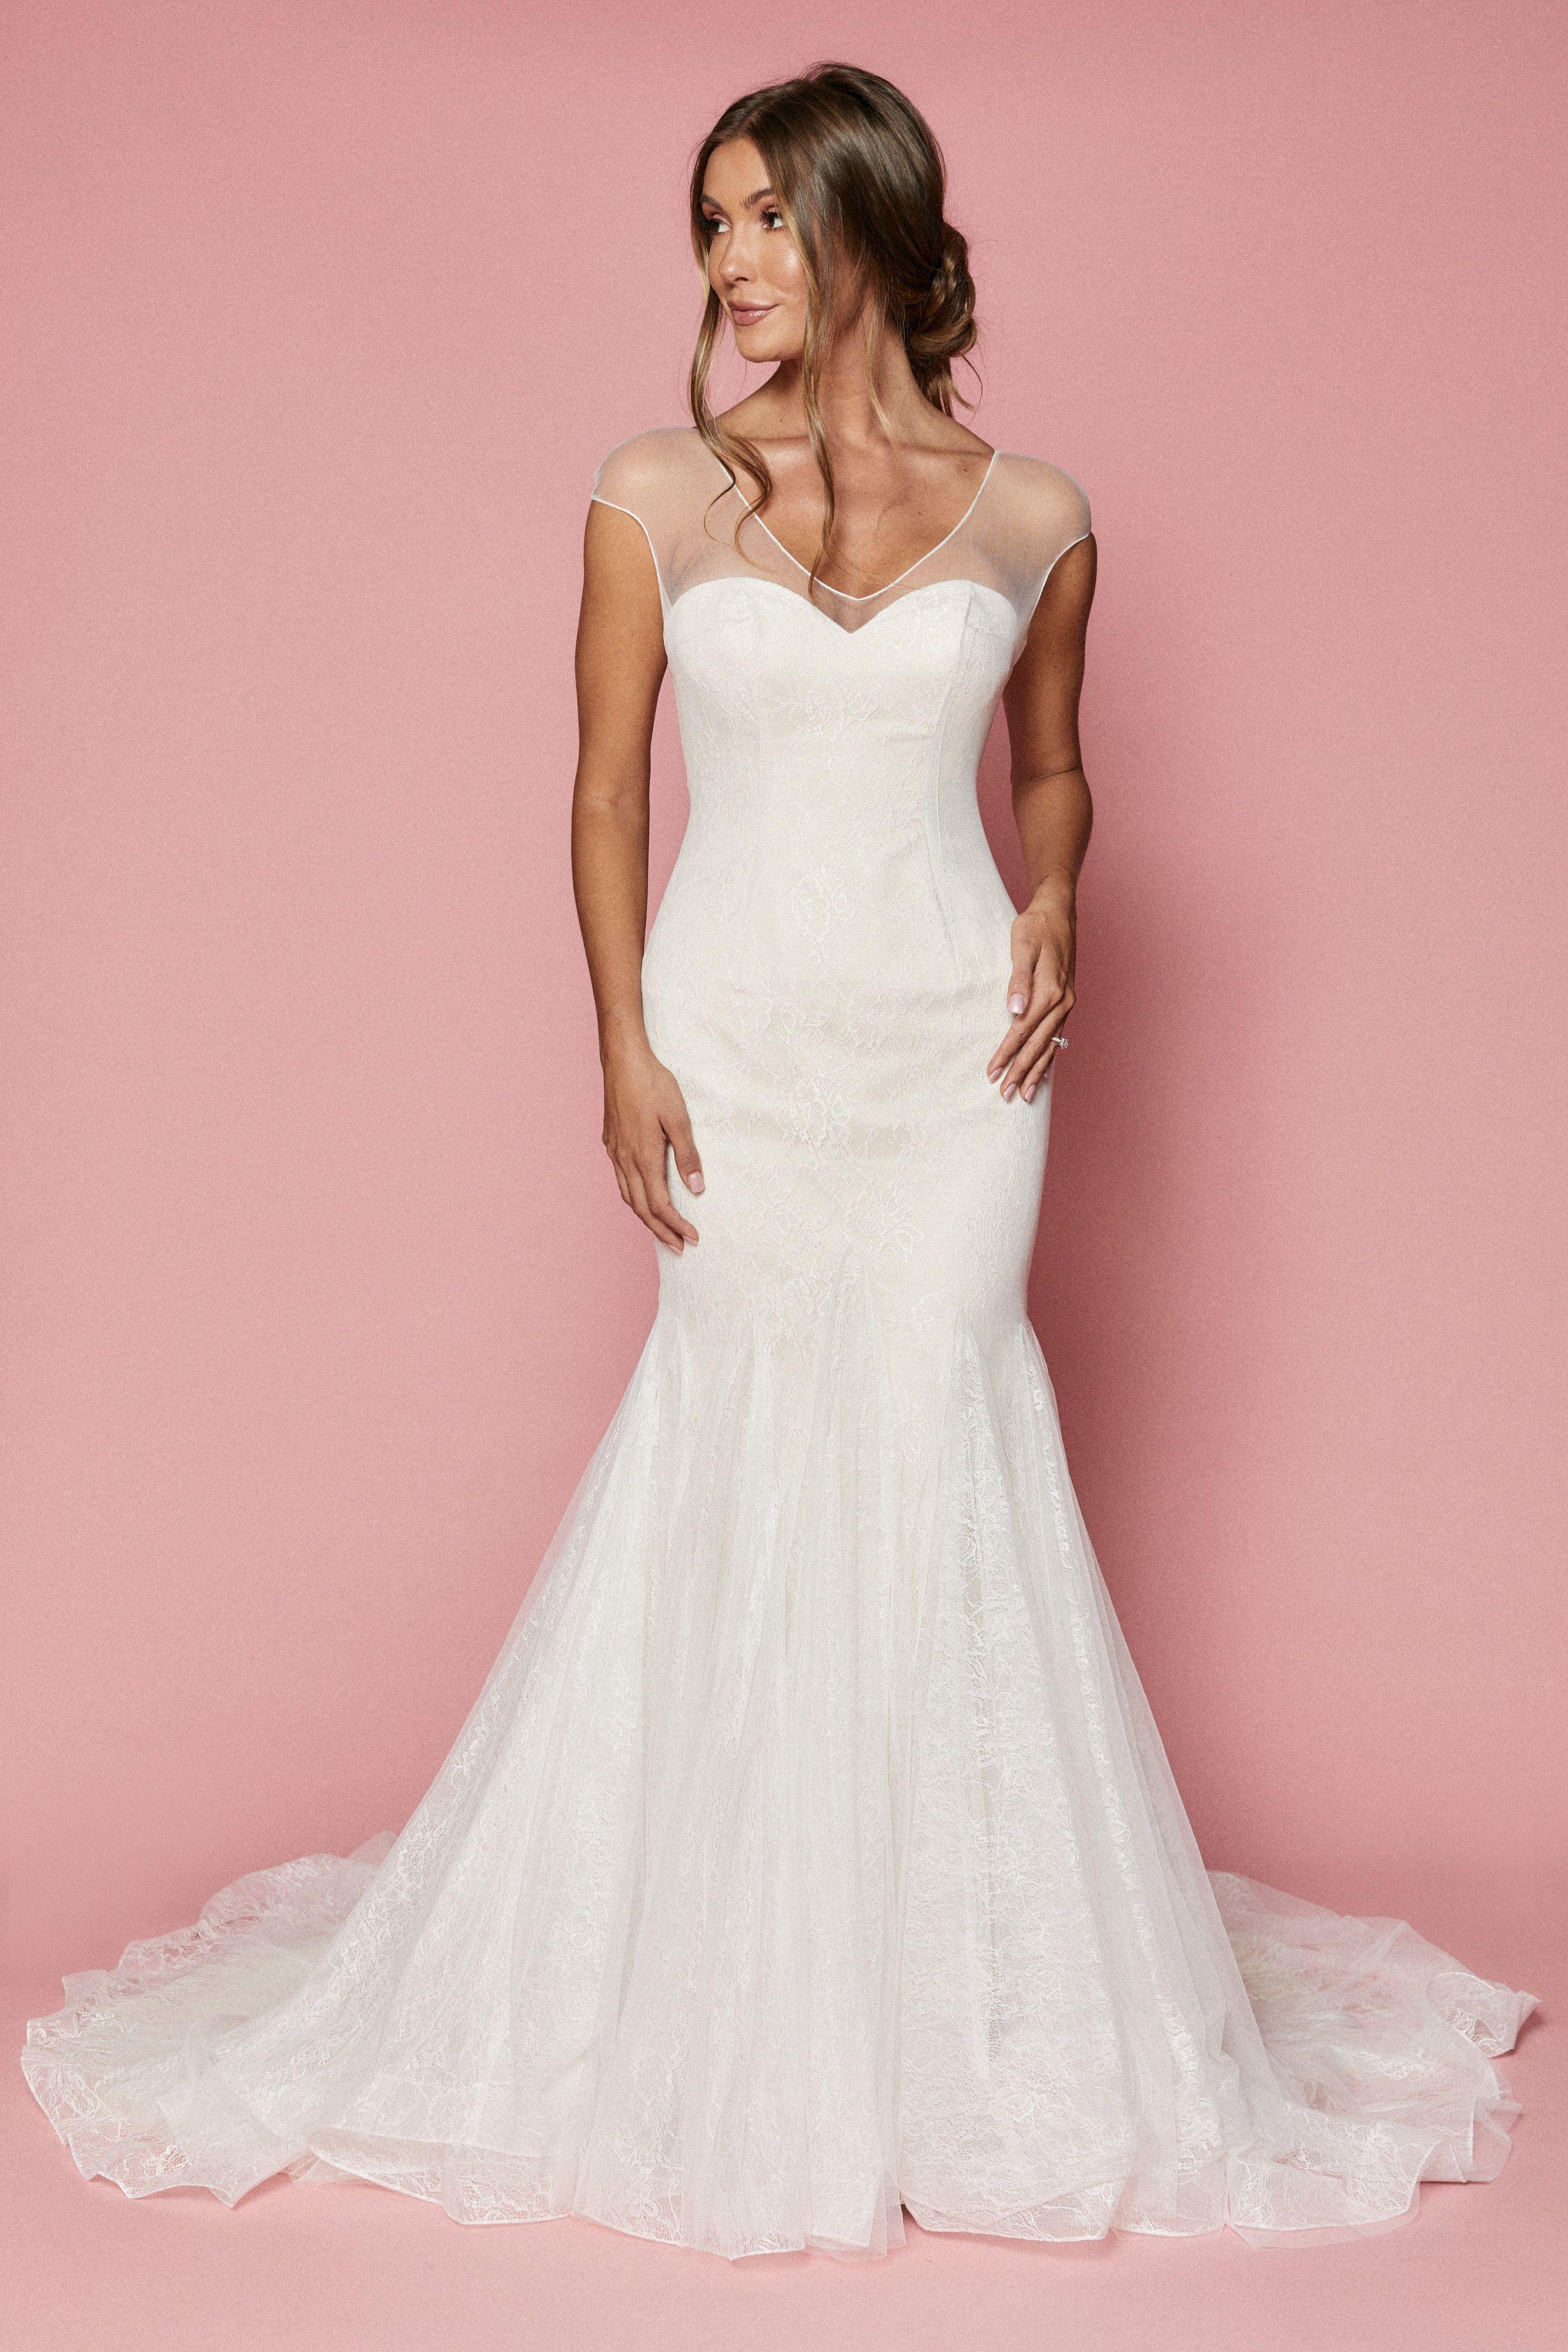 2020 Collection Wedding dress store, Best wedding